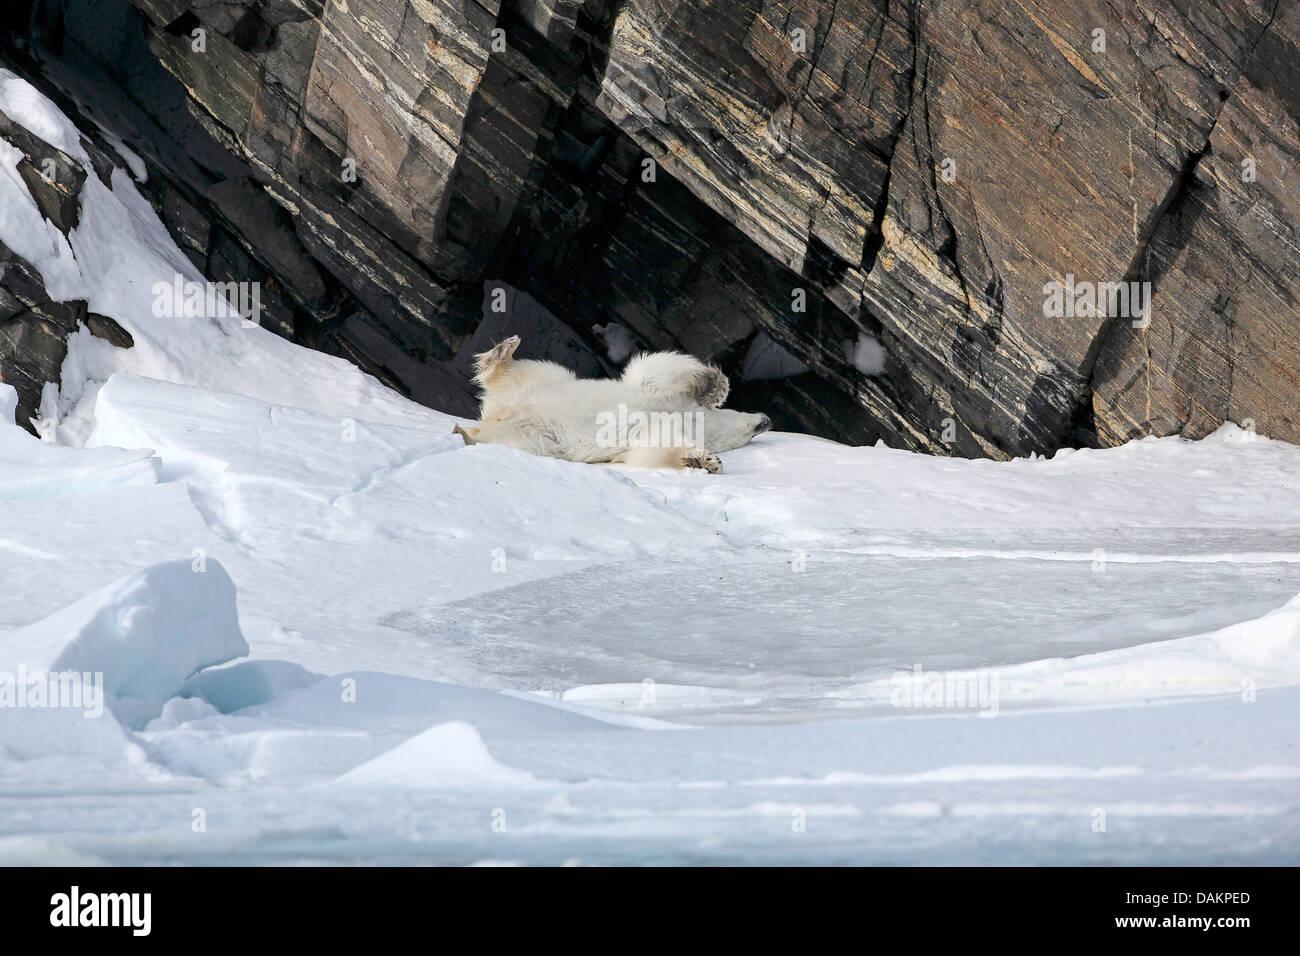 polar bear (Ursus maritimus), polar baer rolling in the snow, Canada, Nunavut - Stock Image